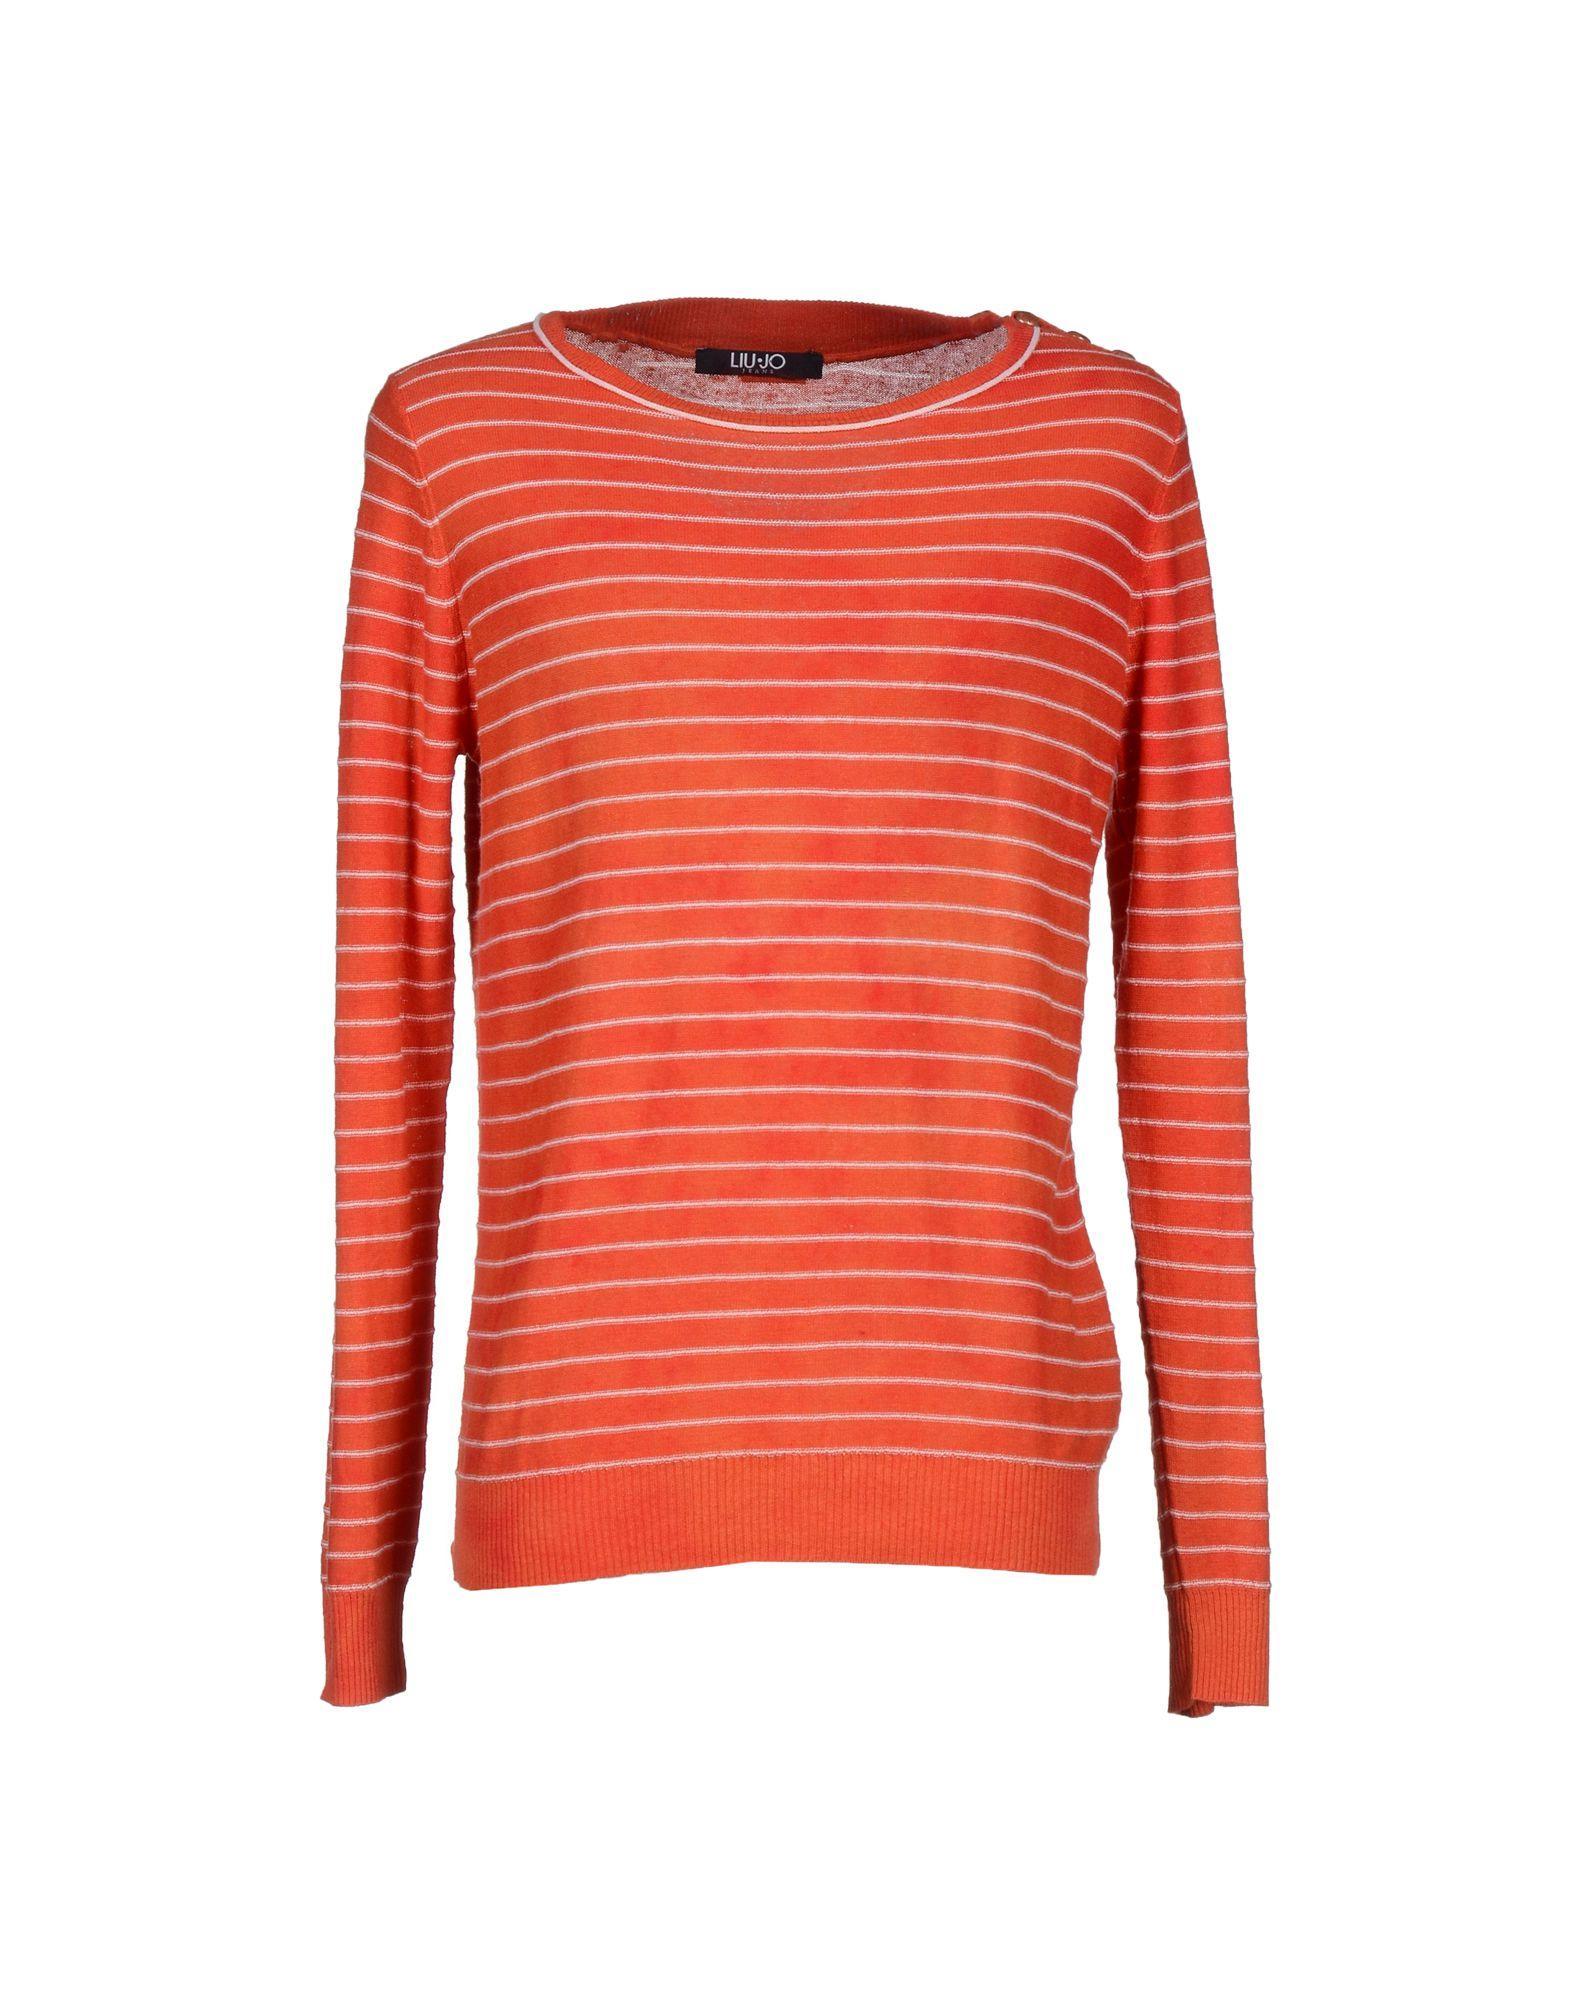 Liu •jo Sweater In Rust